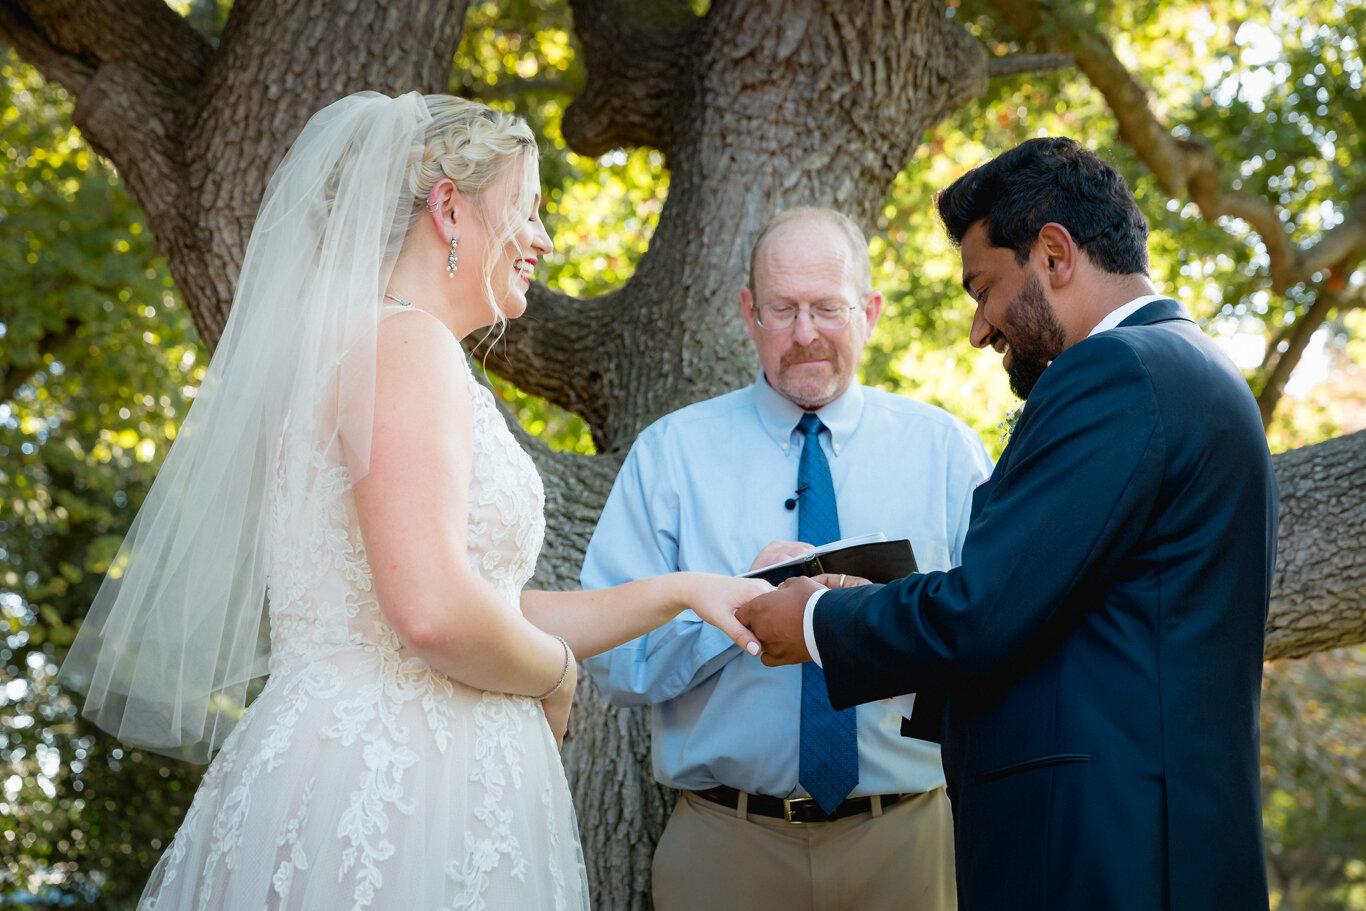 2019.08.24_Emily-Ashir-Wedding-at-the-Maples-5904.jpg